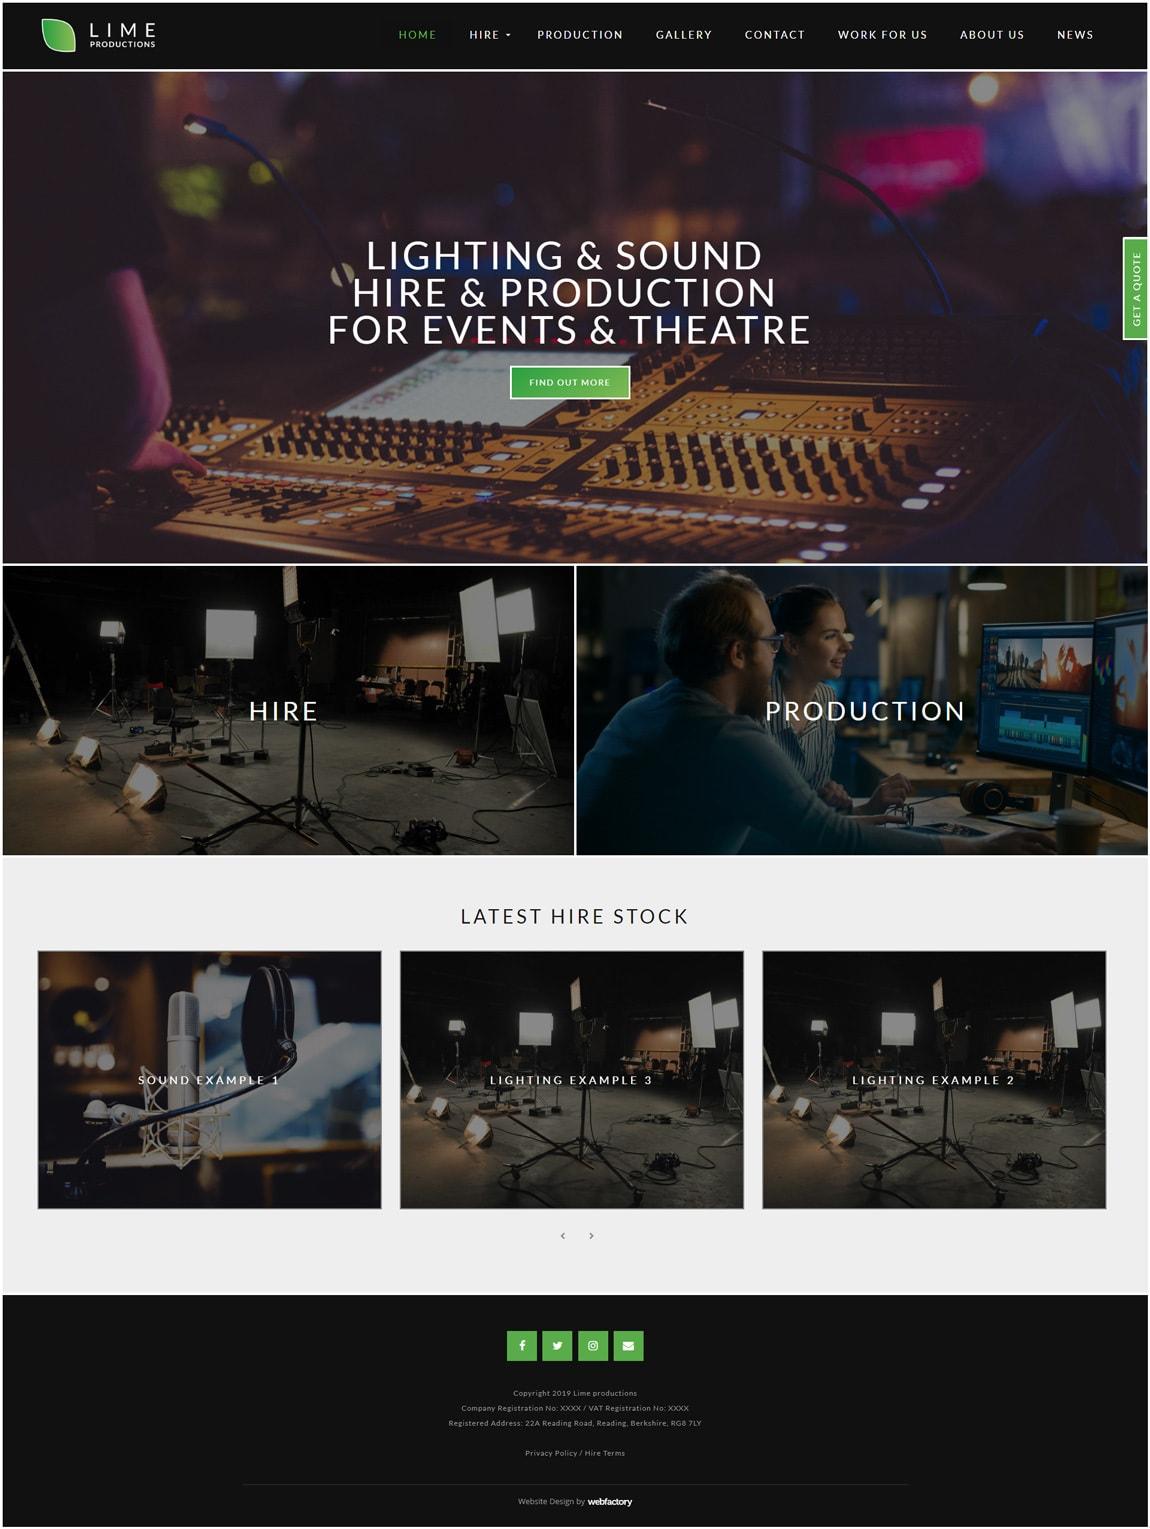 Film Website Design Examples - Webfactory